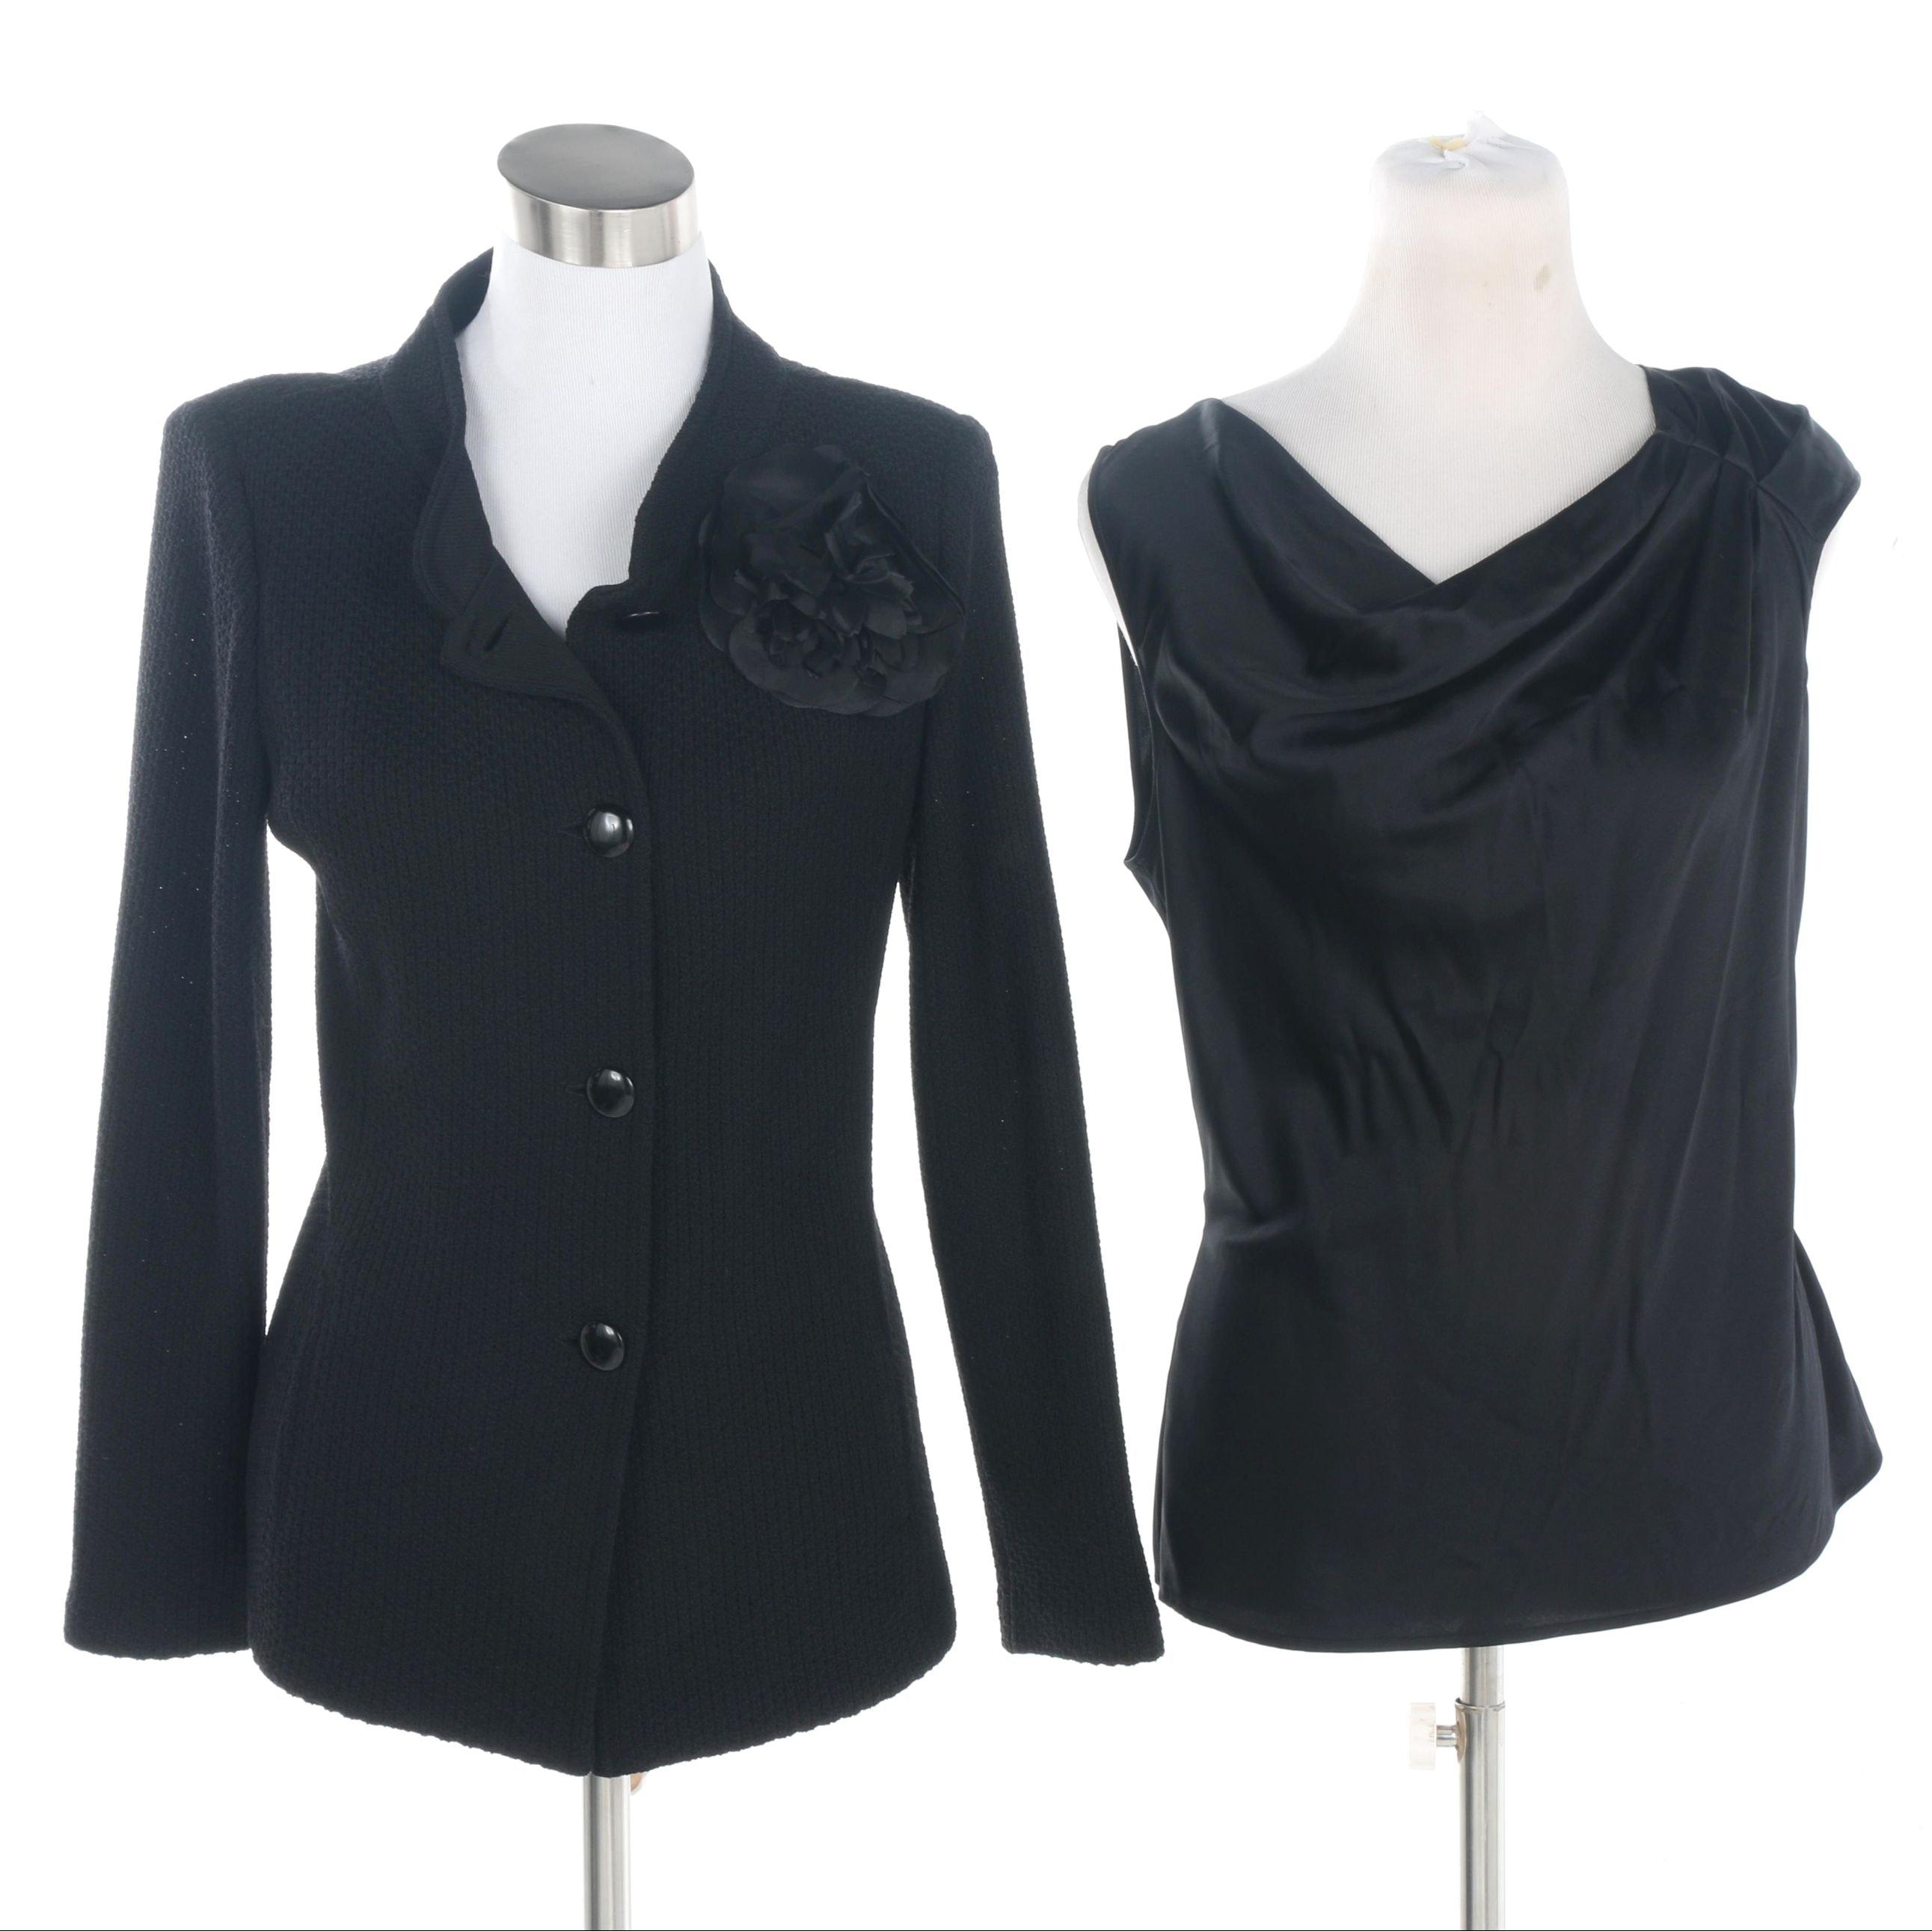 Women's St. John Caviar Black Jacket and St. John Sleeveless Blouse